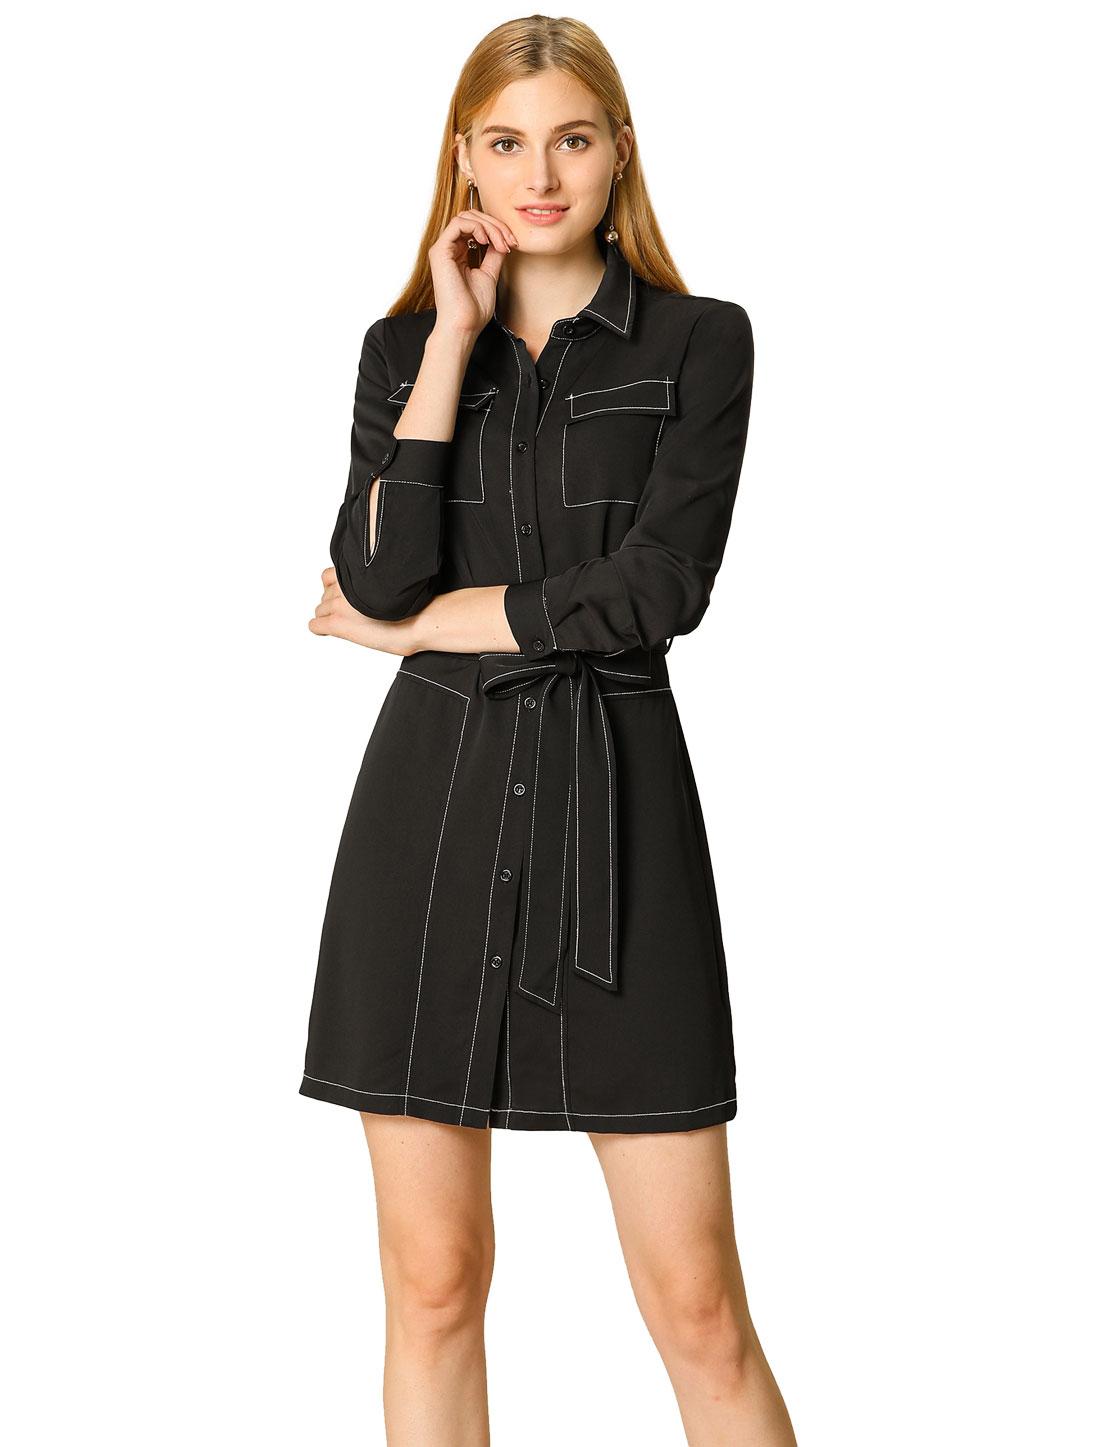 Allegra K Women's Contrast Long Sleeves Belted Waist Dress Black S